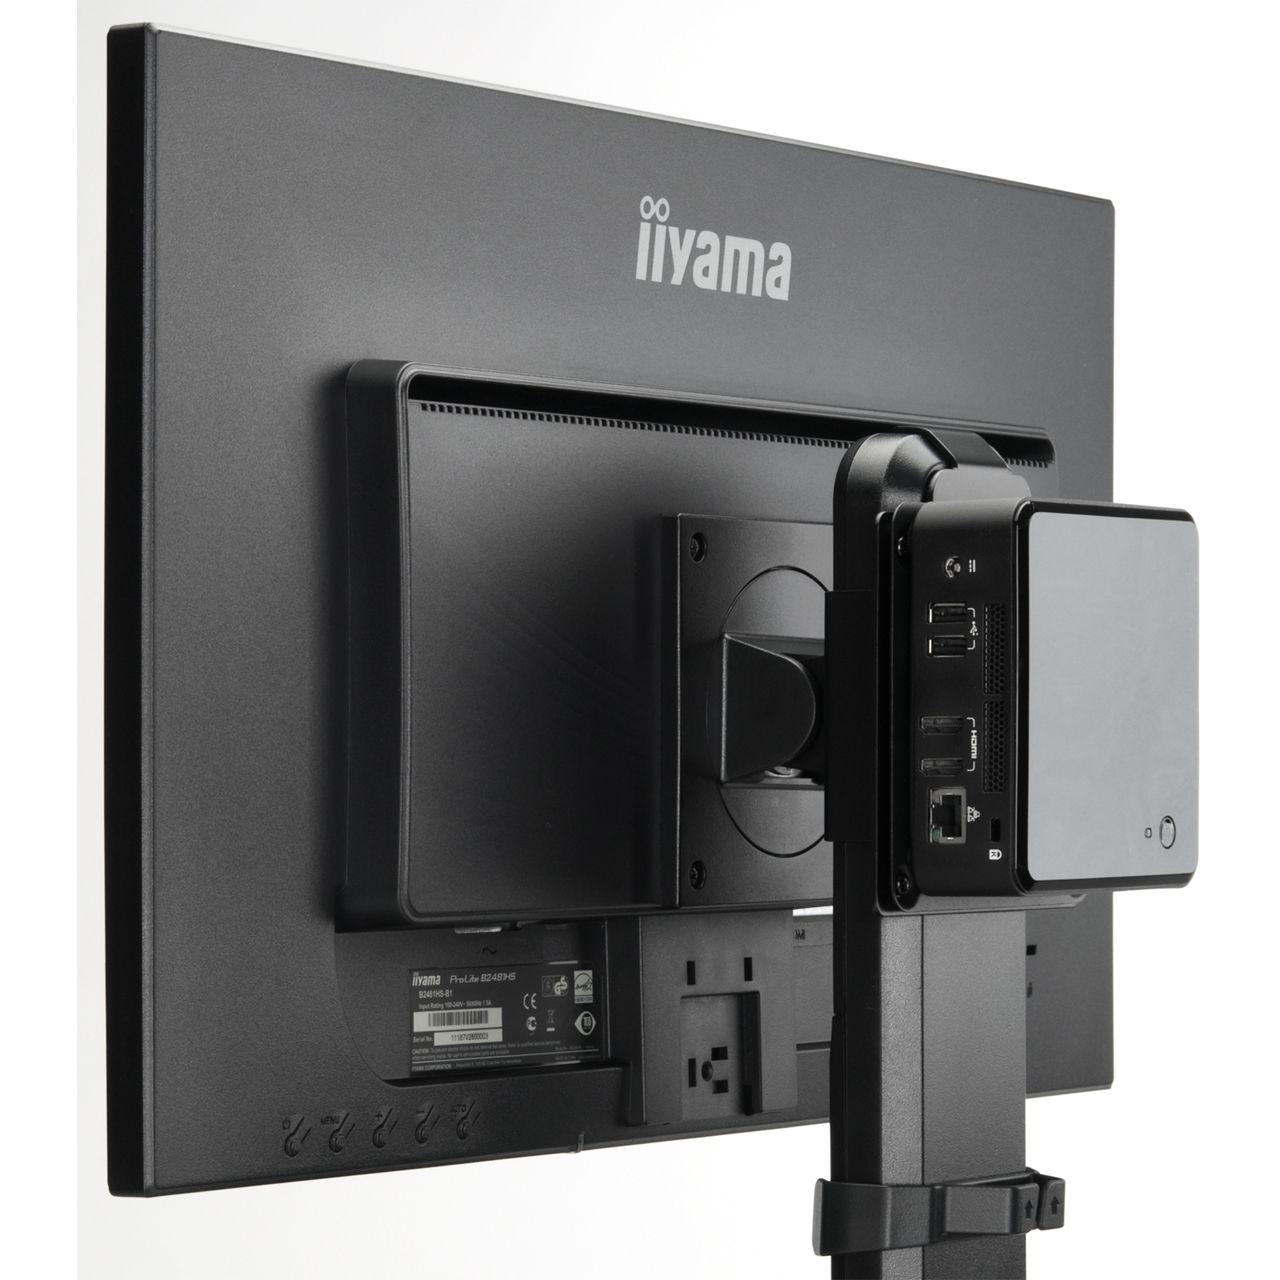 iiyama halterung f r mini pc md brpcv01. Black Bedroom Furniture Sets. Home Design Ideas